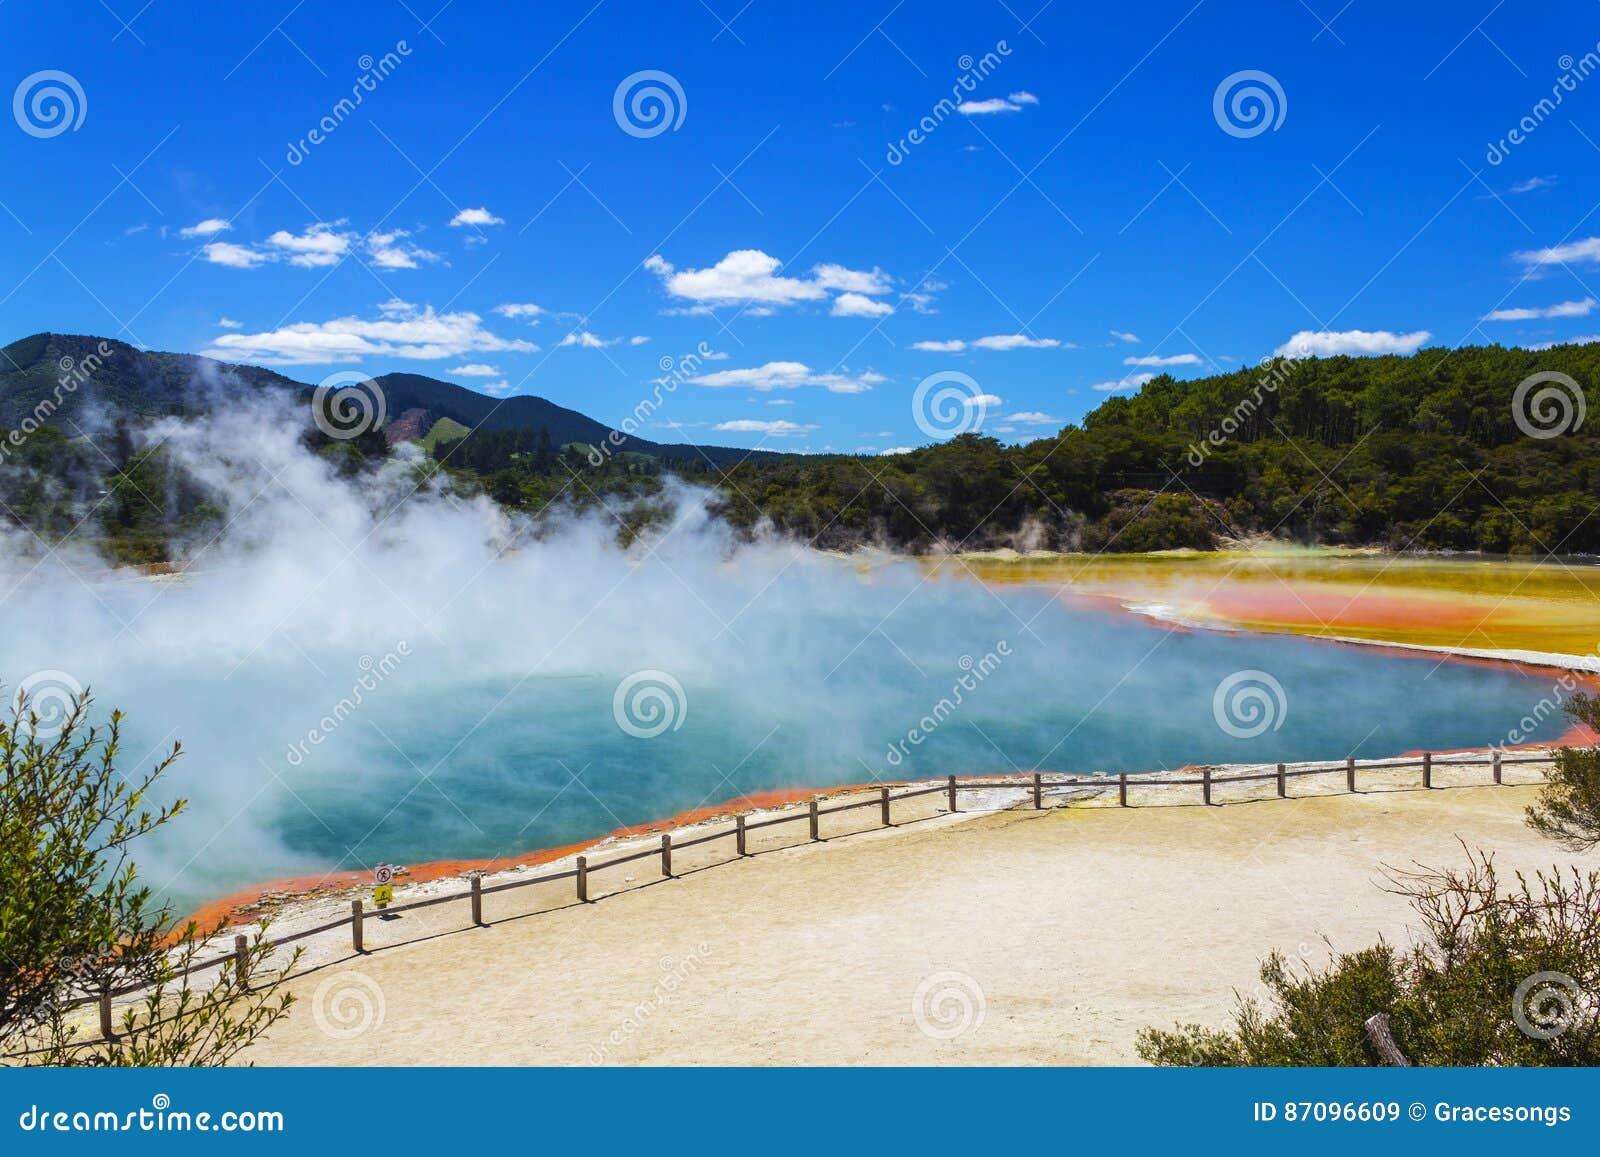 "Champagne Pool in Wai-O-Tapu oder heiliges Wasser †""thermischem Märchenland Rotorua Neuseeland"